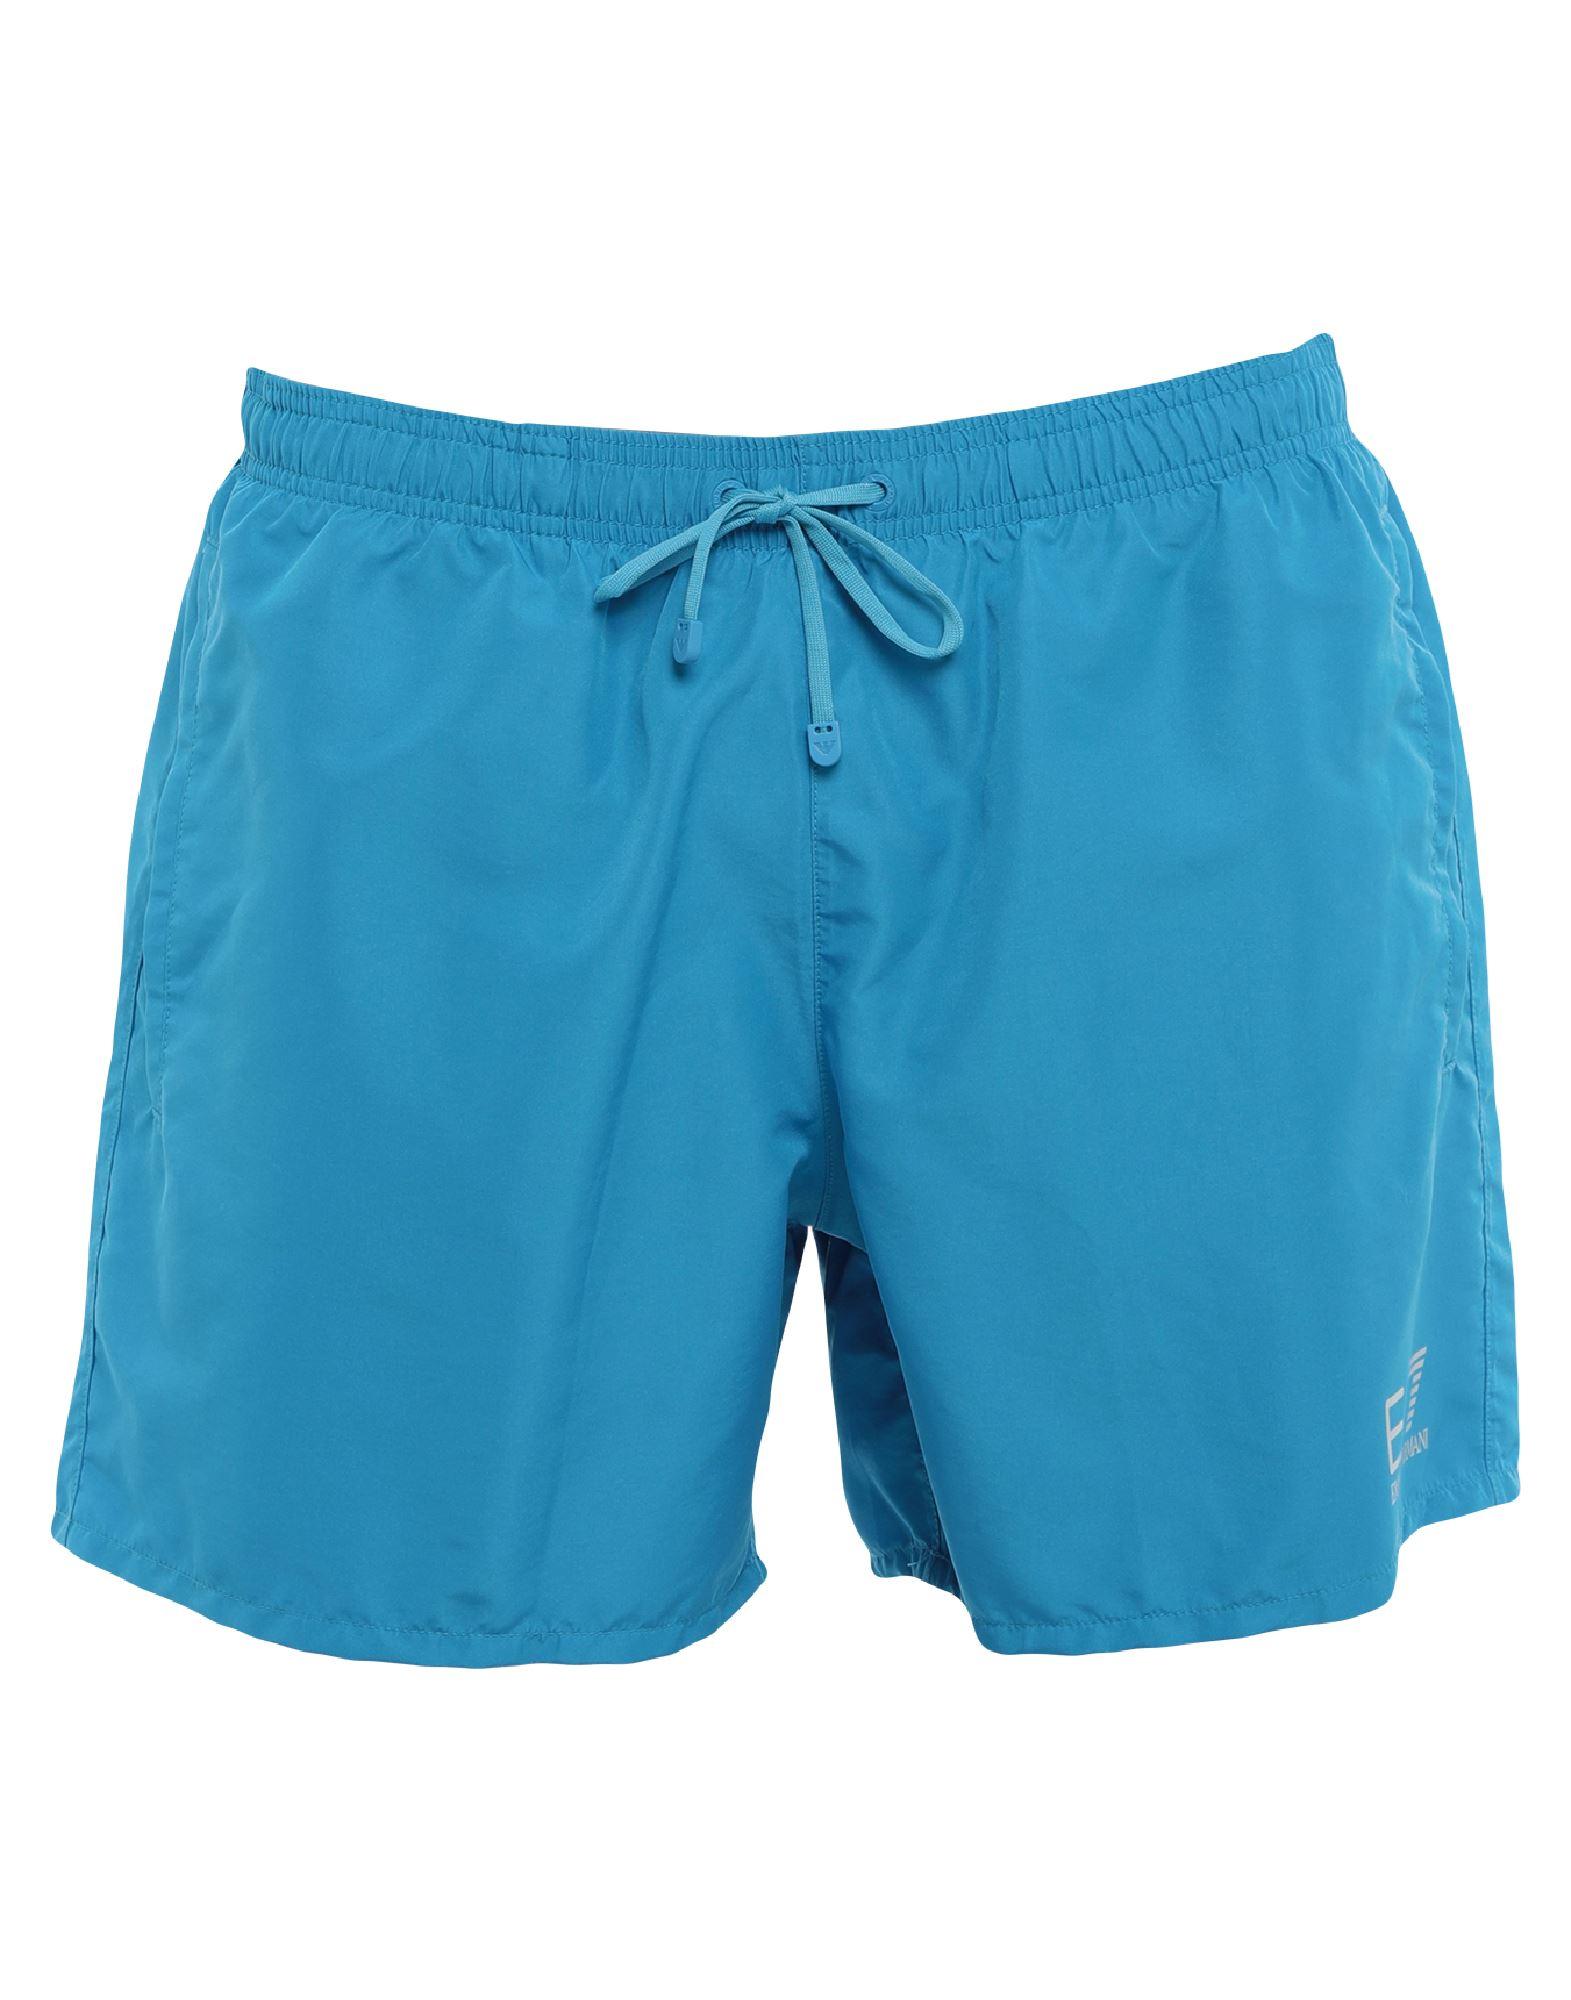 EA7 Swim trunks - Item 47261817